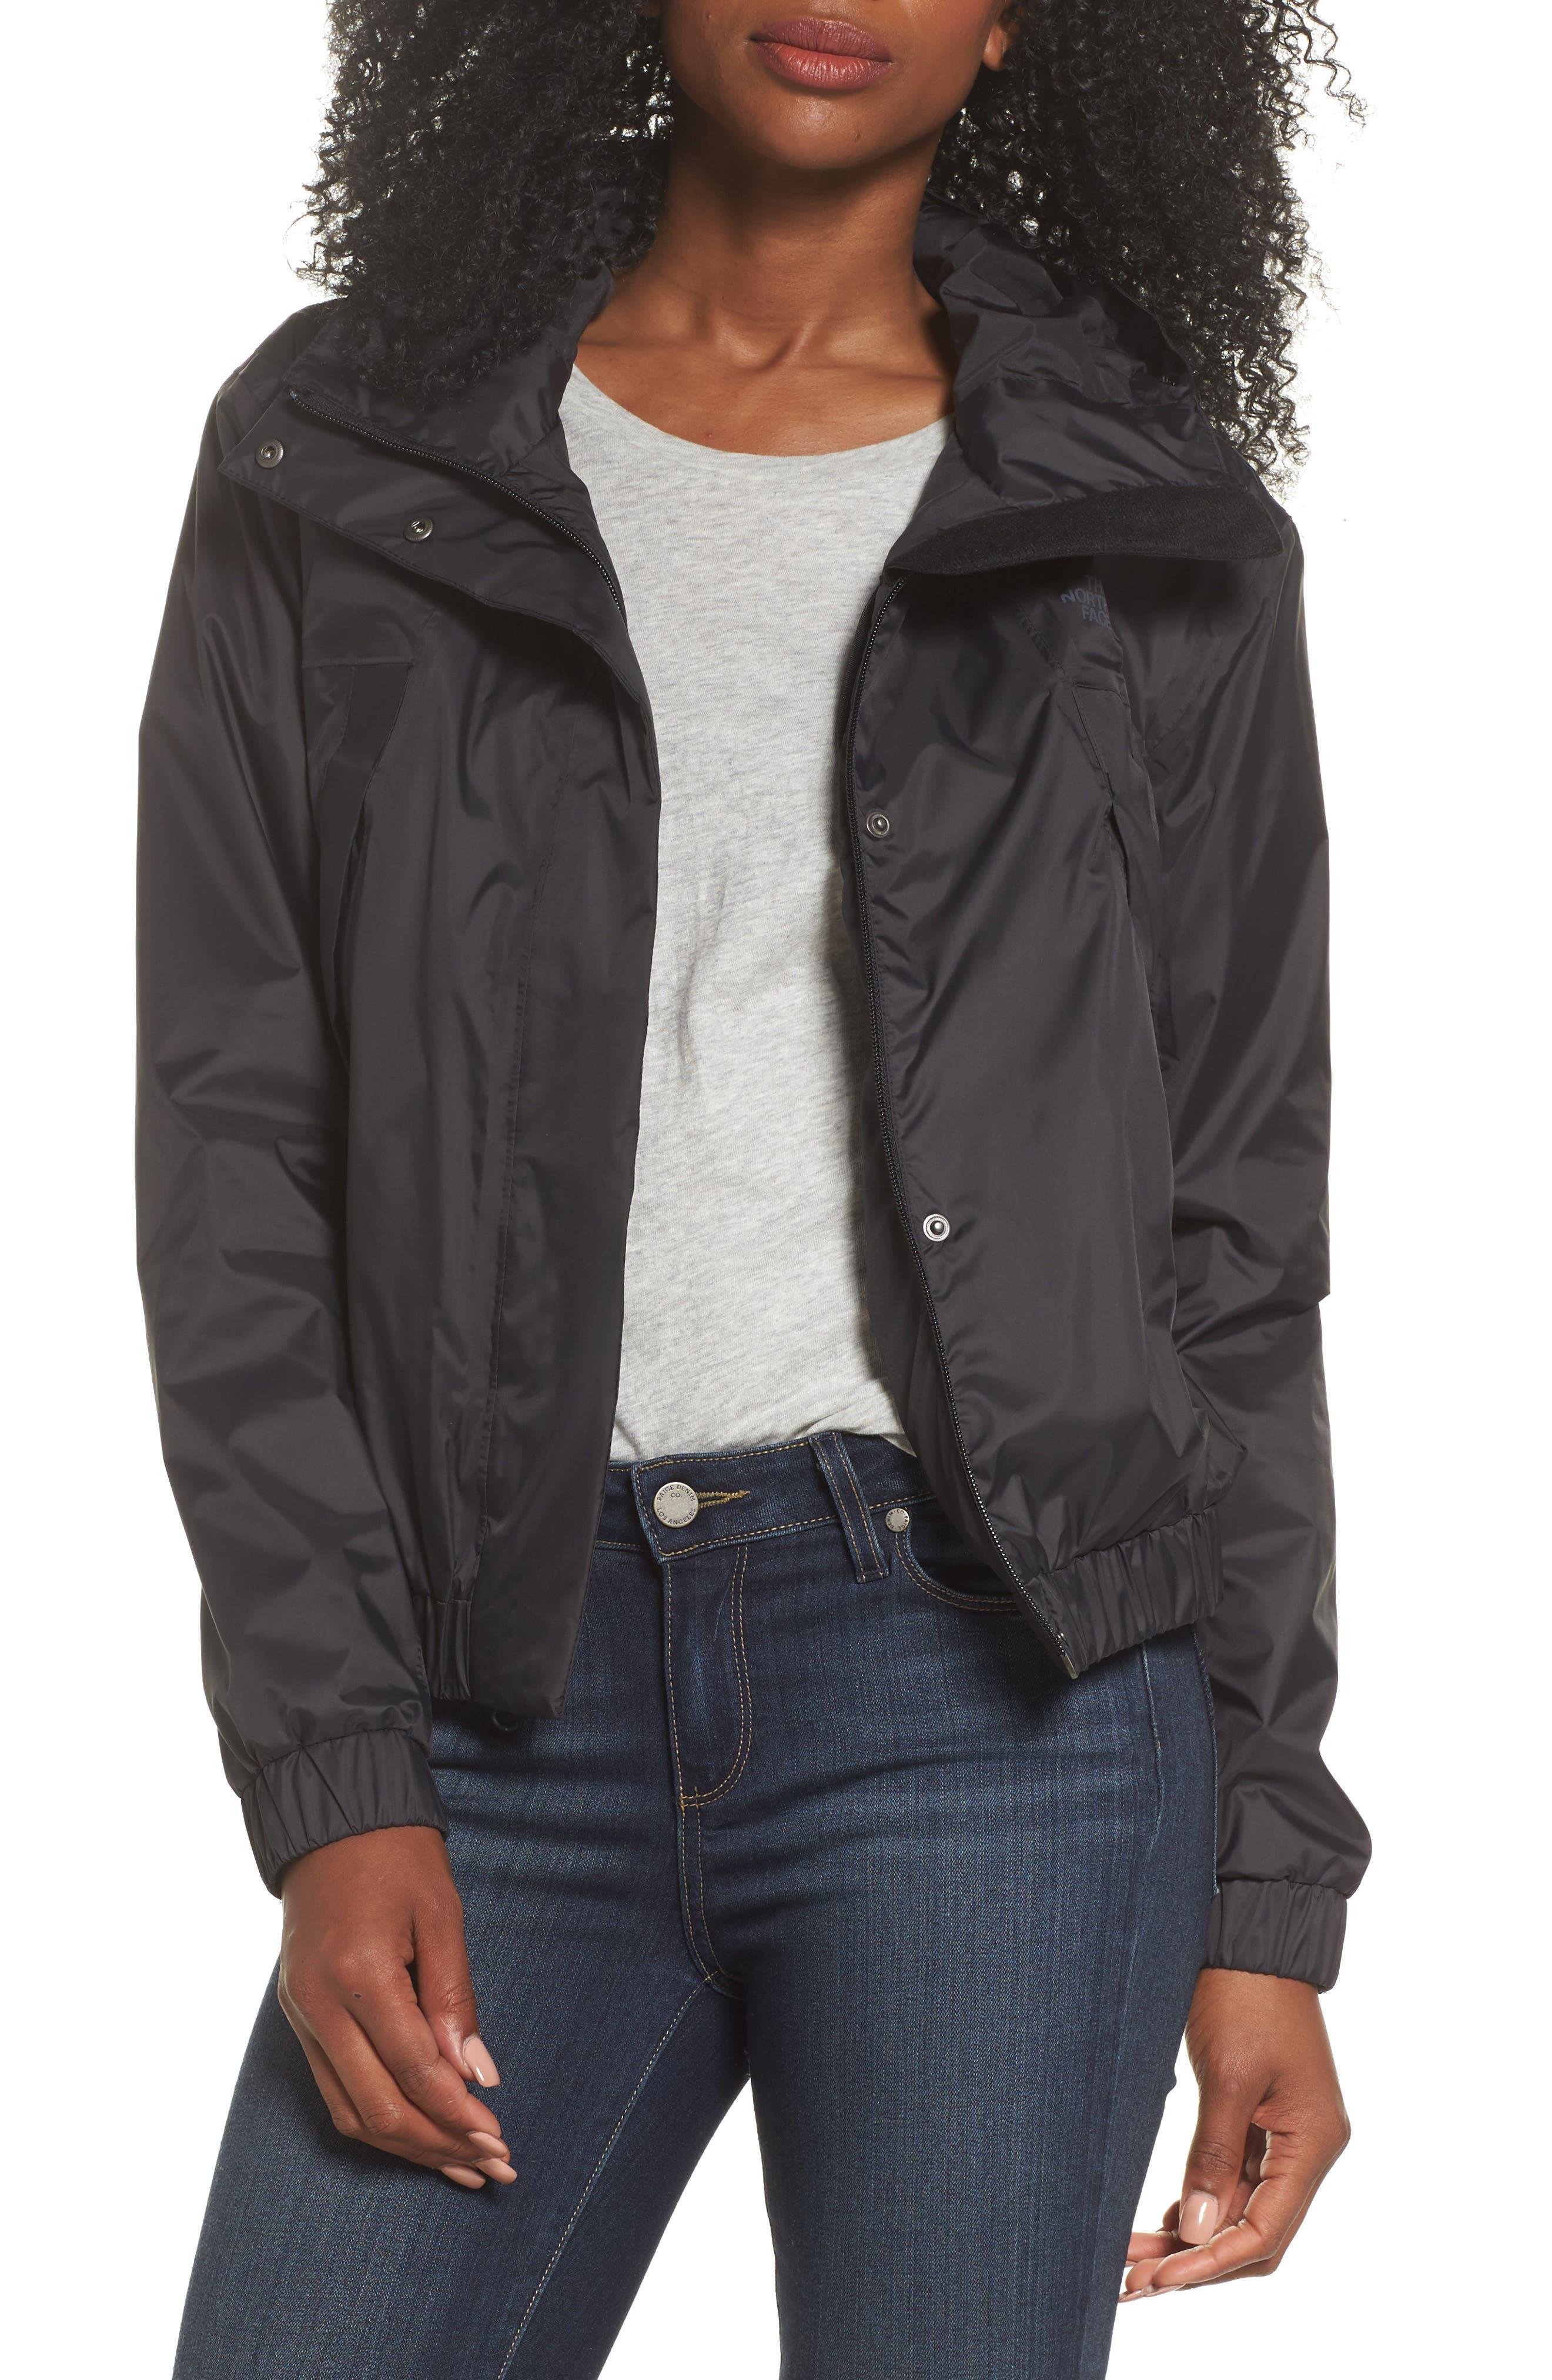 Precita Rain Jacket,                         Main,                         color, Tnf Black